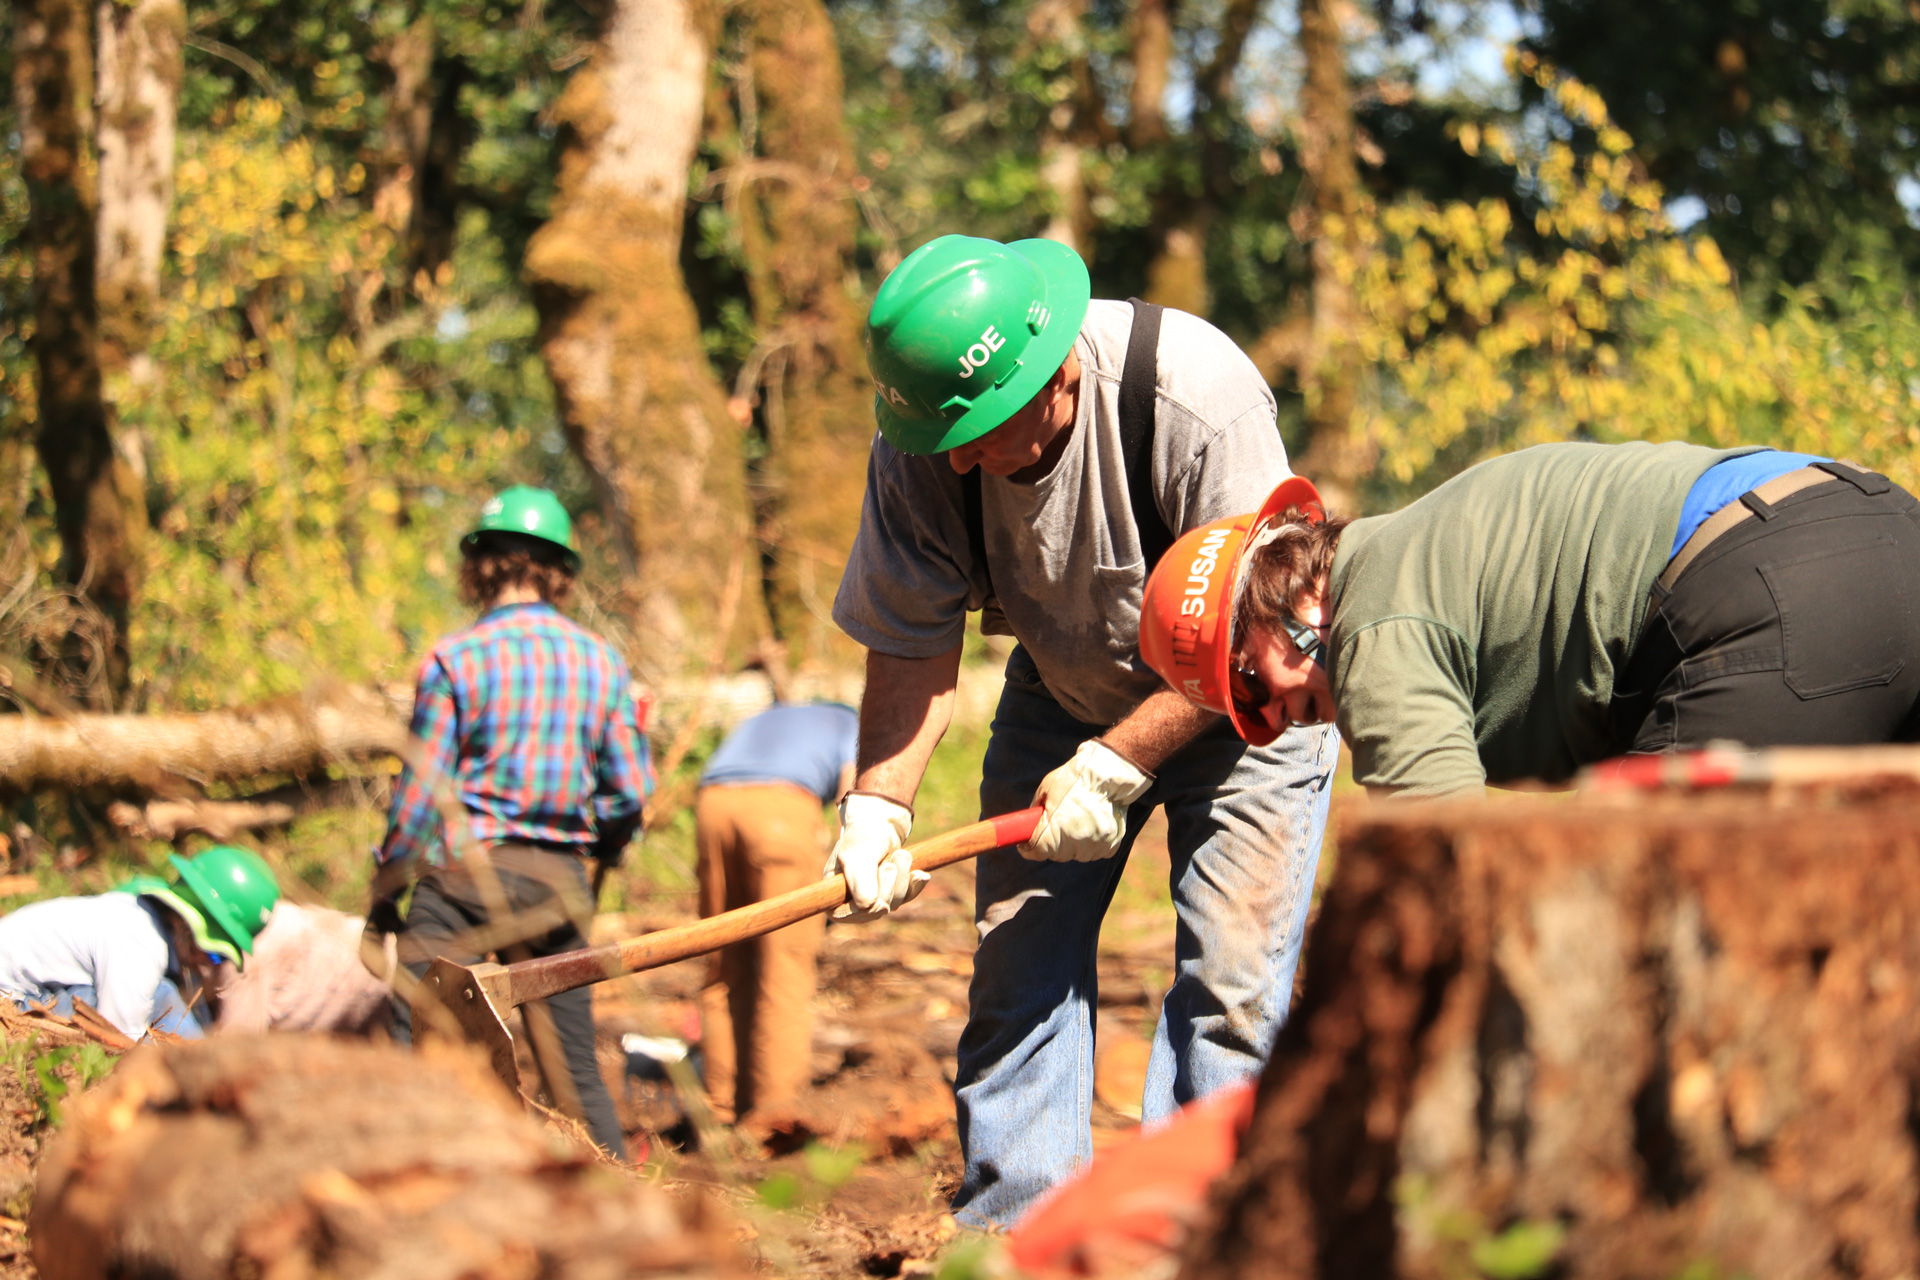 Working-Near-Stump-Focused.jpg